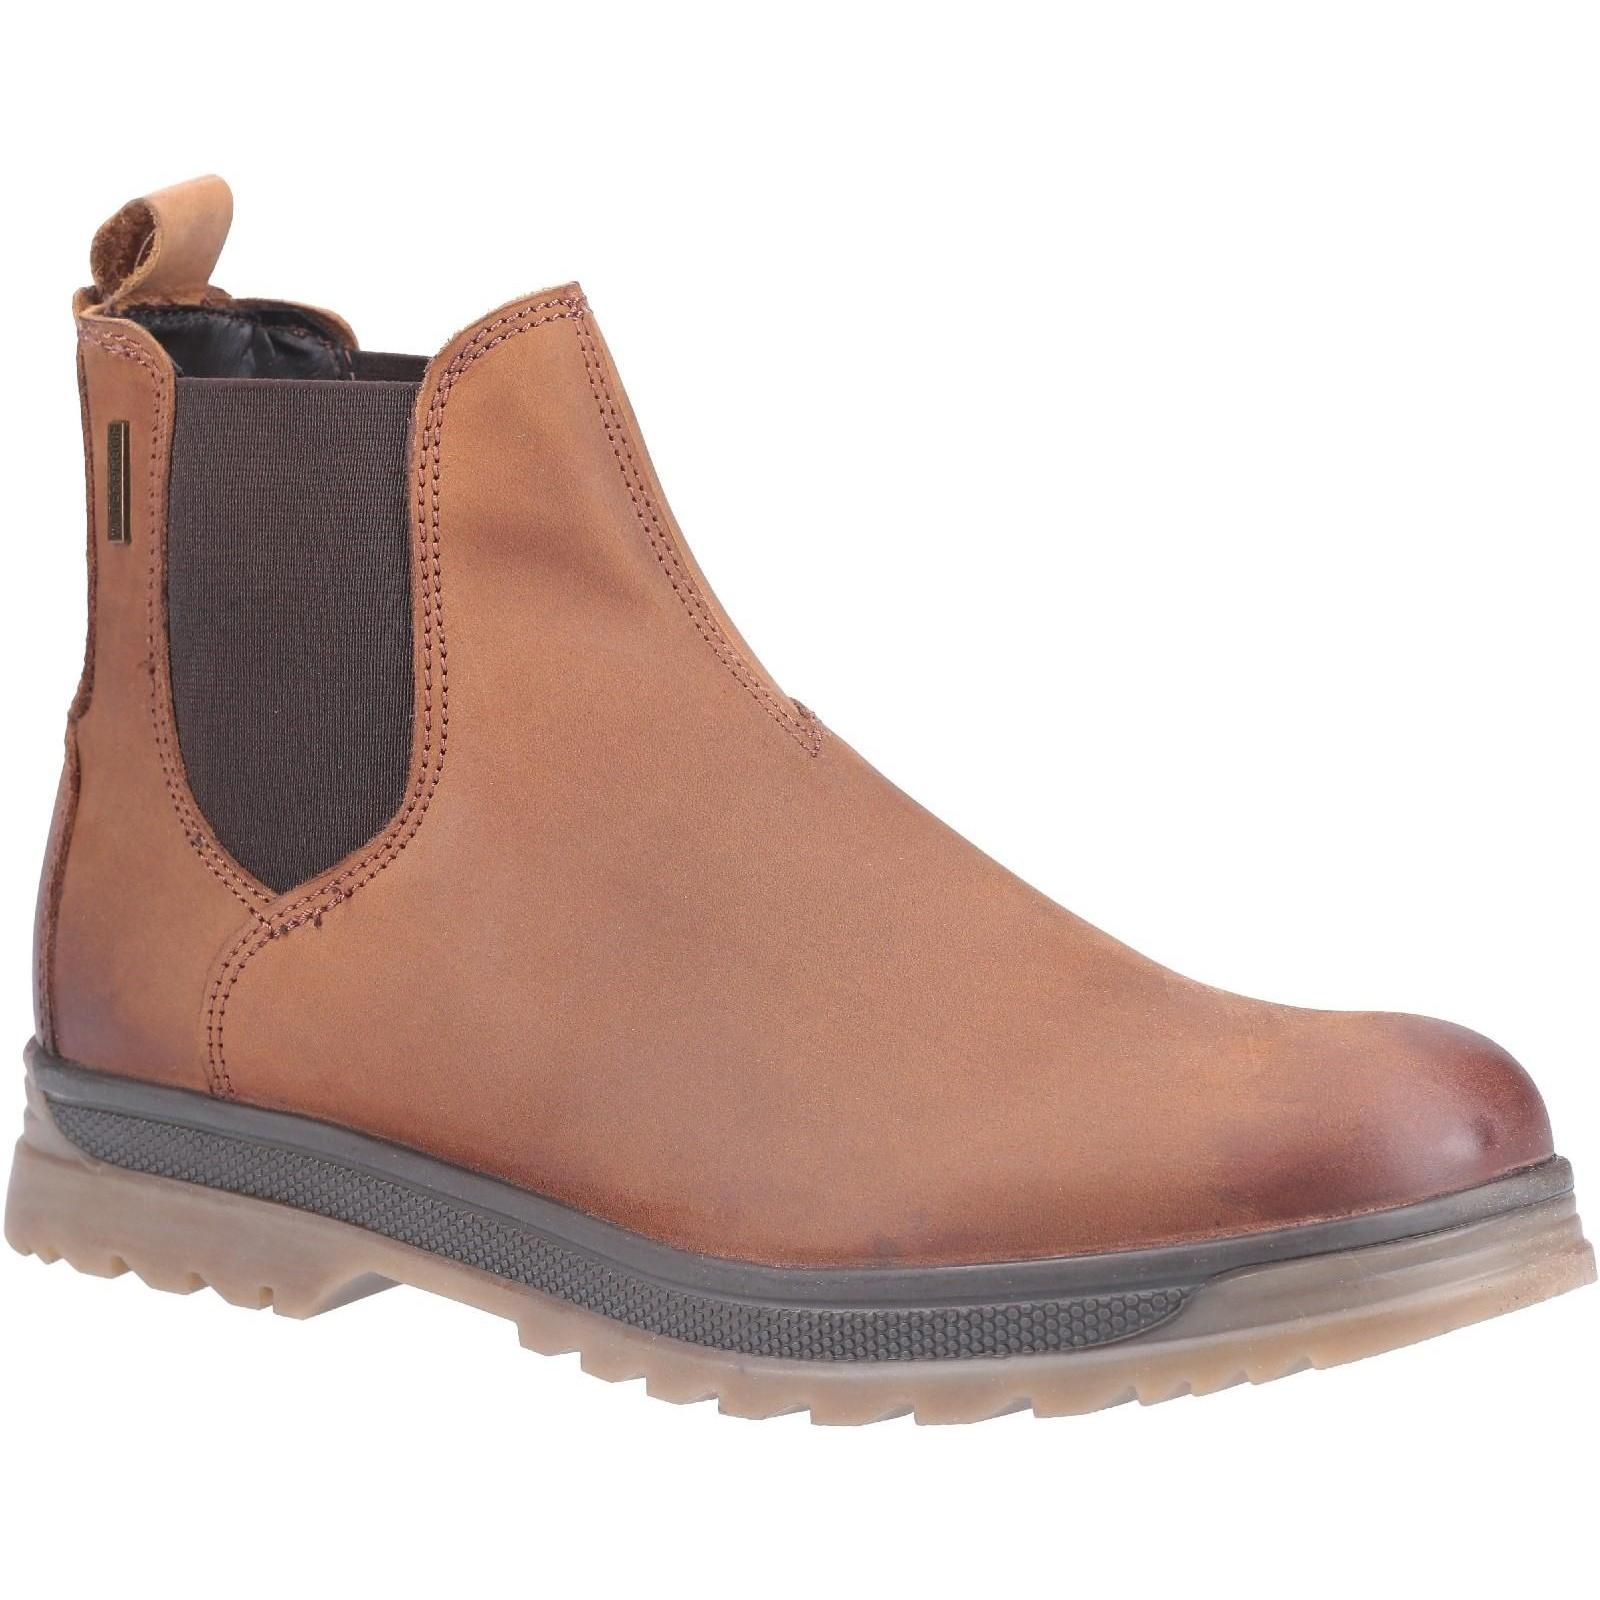 Trespass Mens Jericho Boots